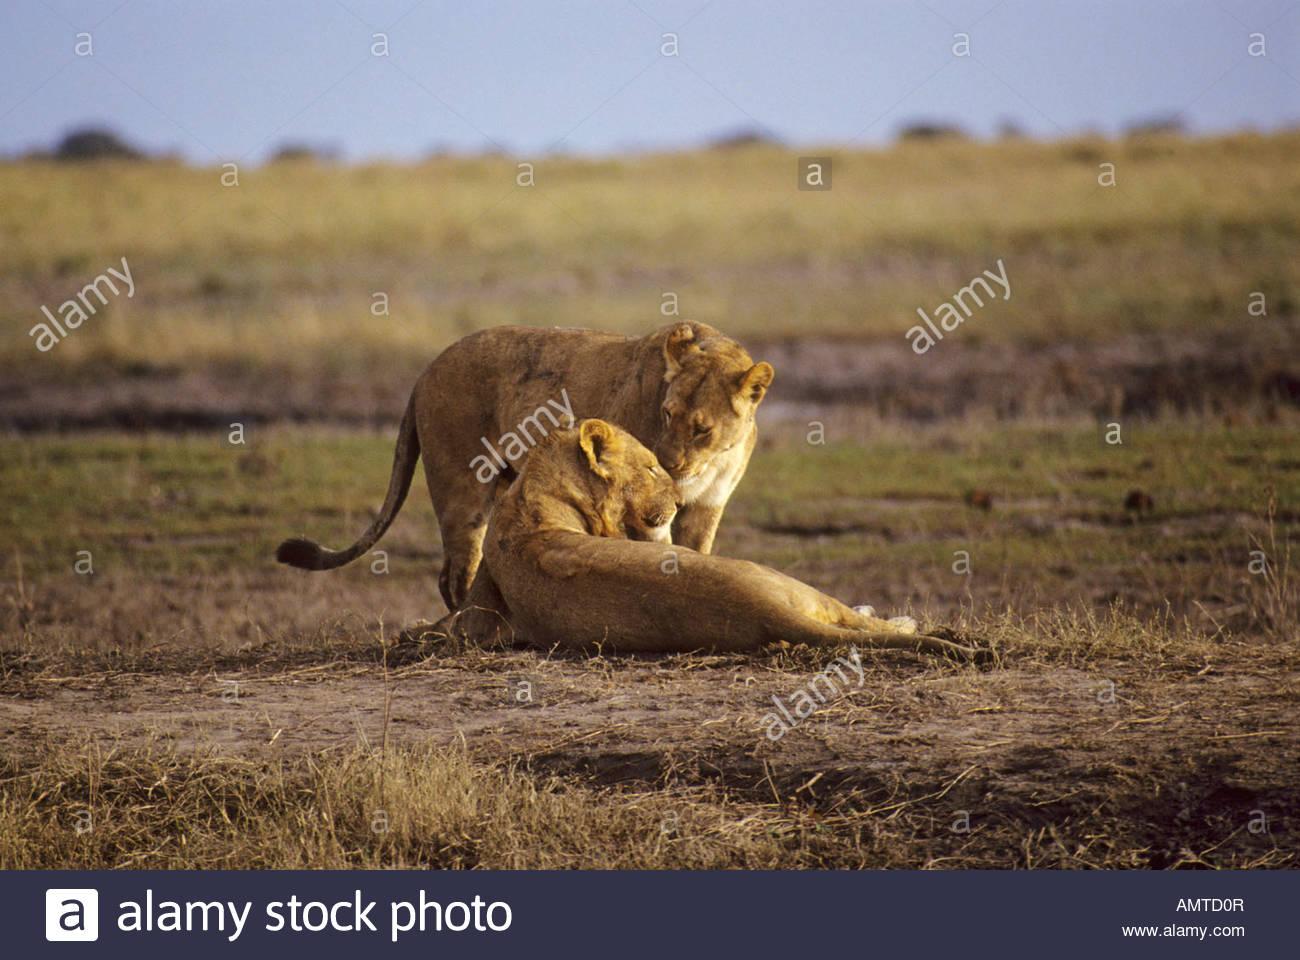 Companionship Panthera Leo Stock Photos Companionship Panthera 1300x960